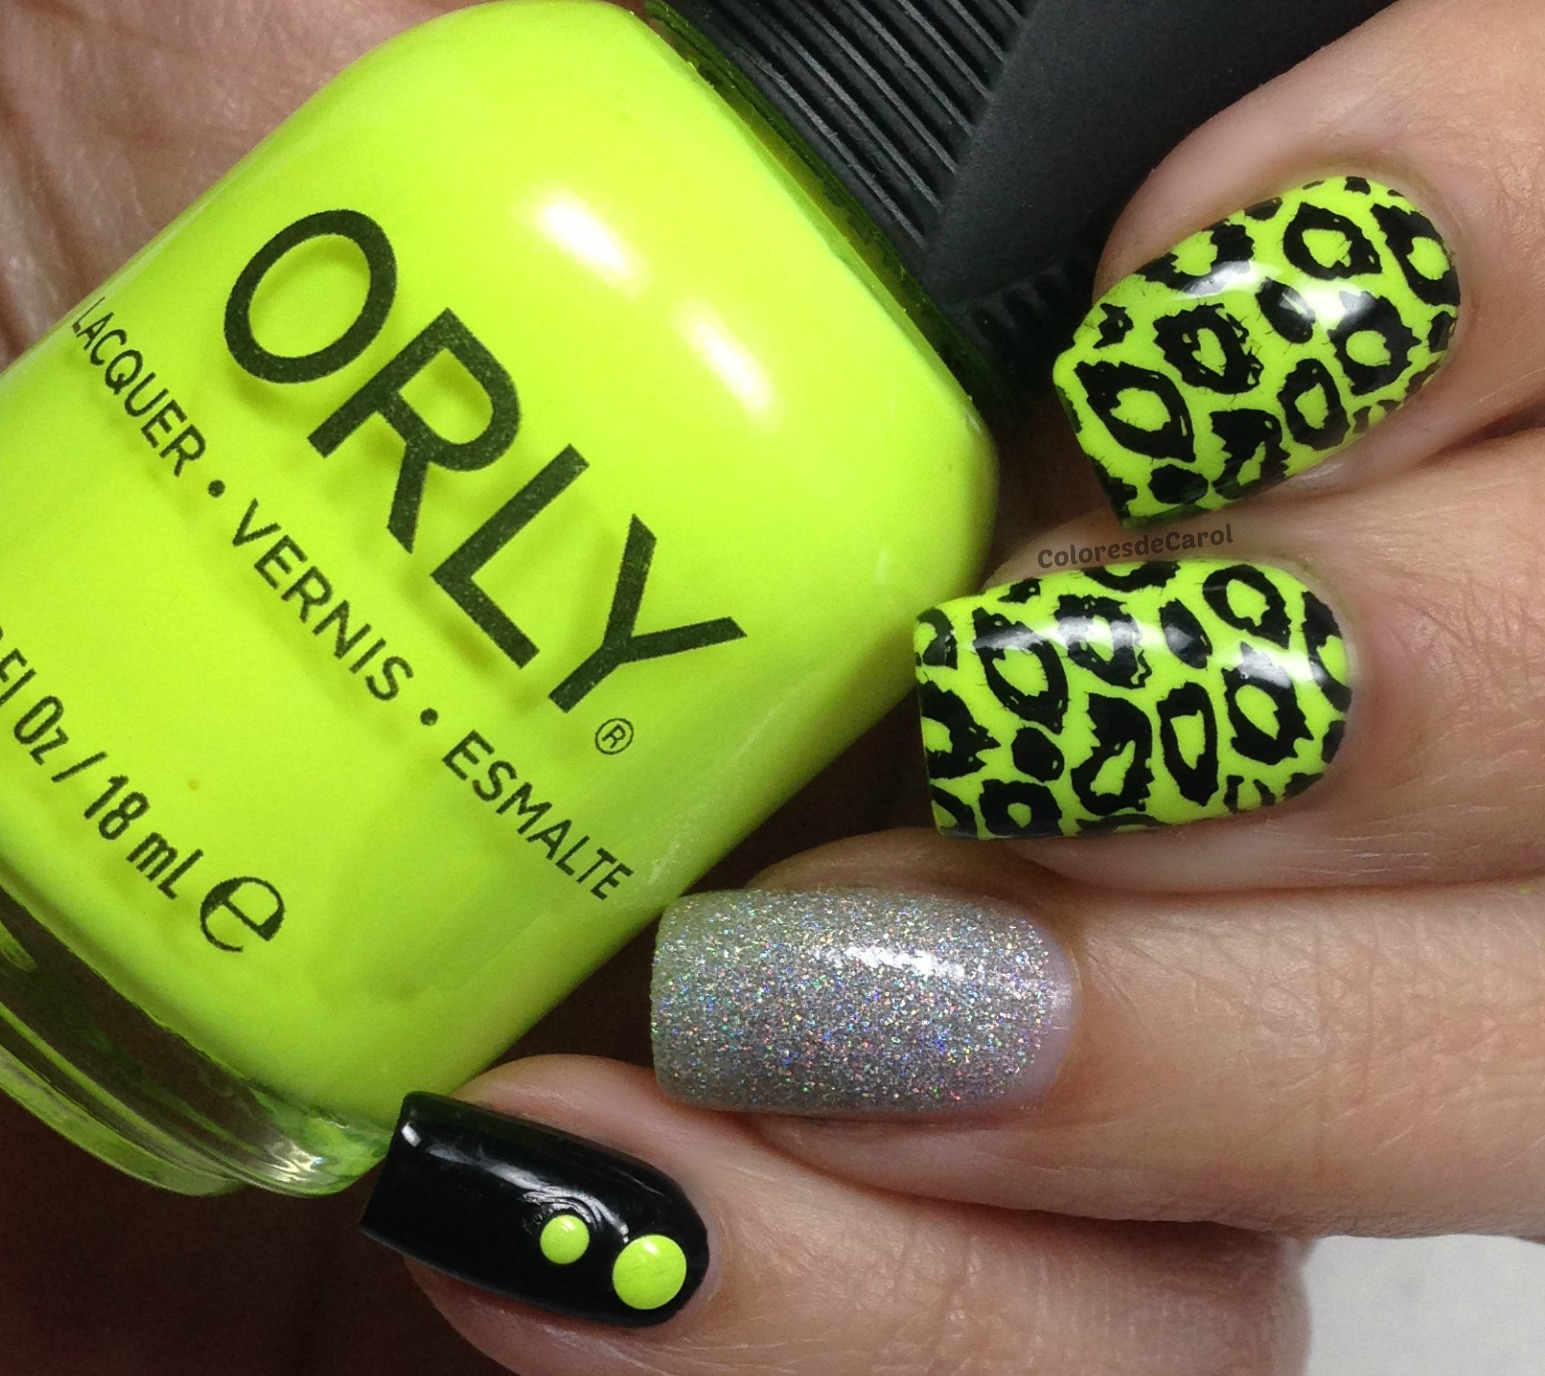 Colores de Carol: Orly - Glowstick